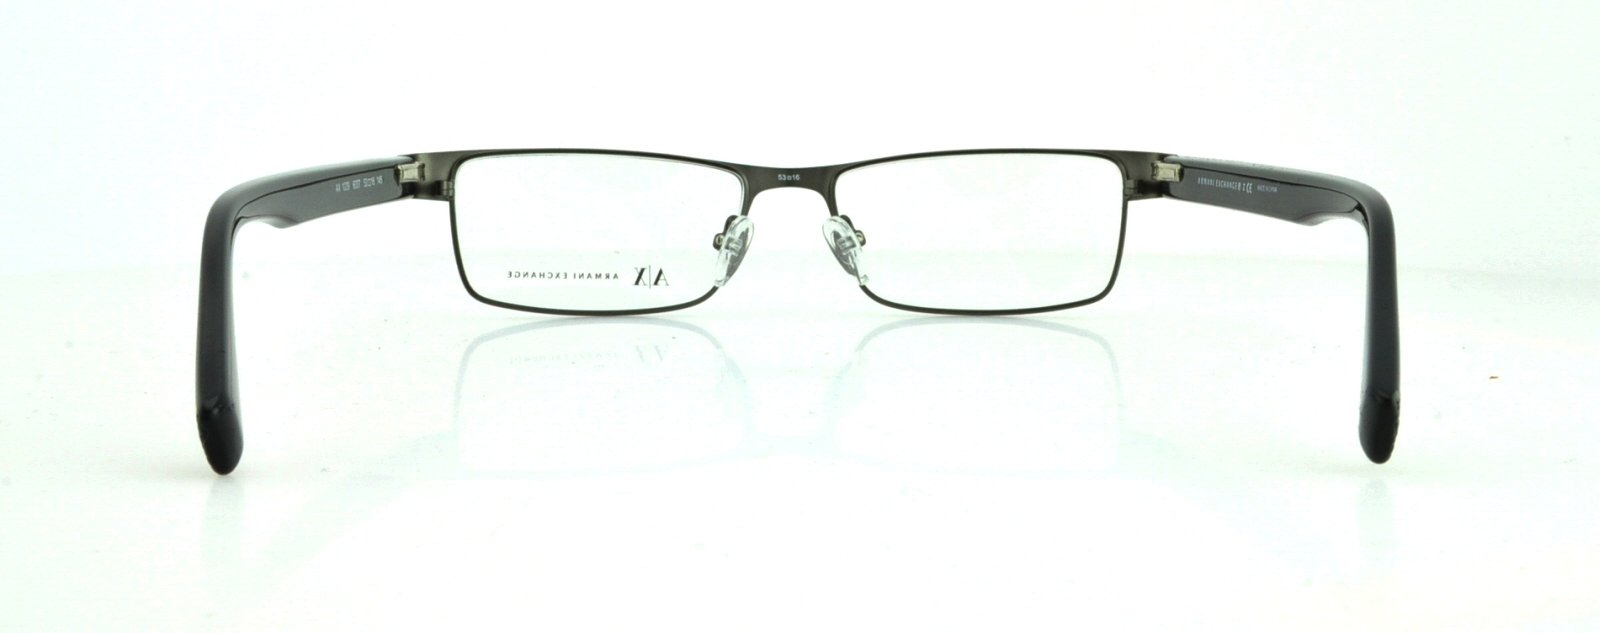 Armani Exchange AX1009 Eyeglass Frames 6037-53 - Satin Gunmetal/Black AX1009-6037-53